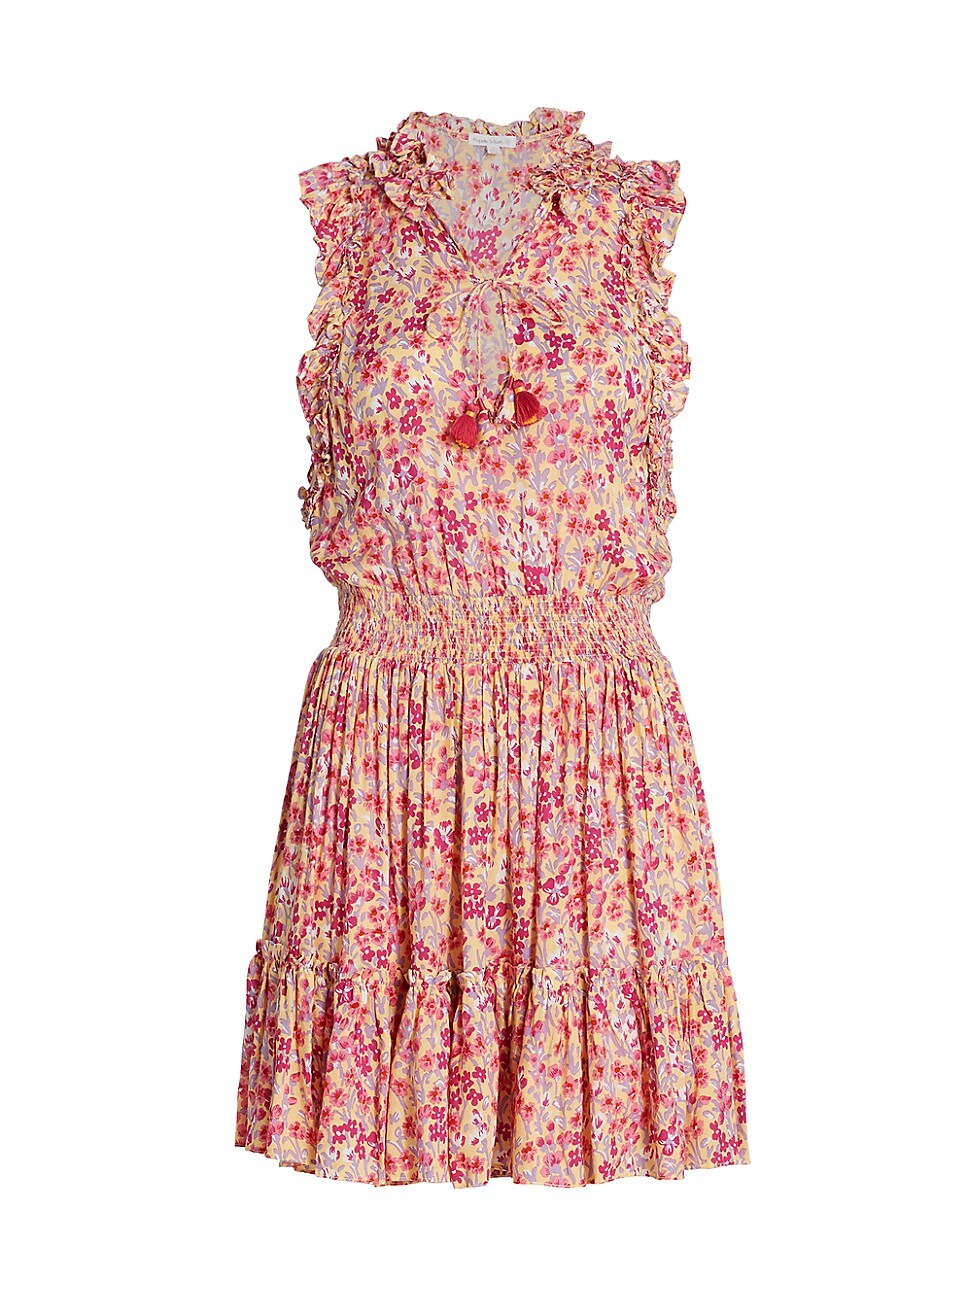 Poupette St Barth WOMEN'S TRINY FLORAL RUFFLE-TRIM TASSEL MINI FLOUNCE DRESS